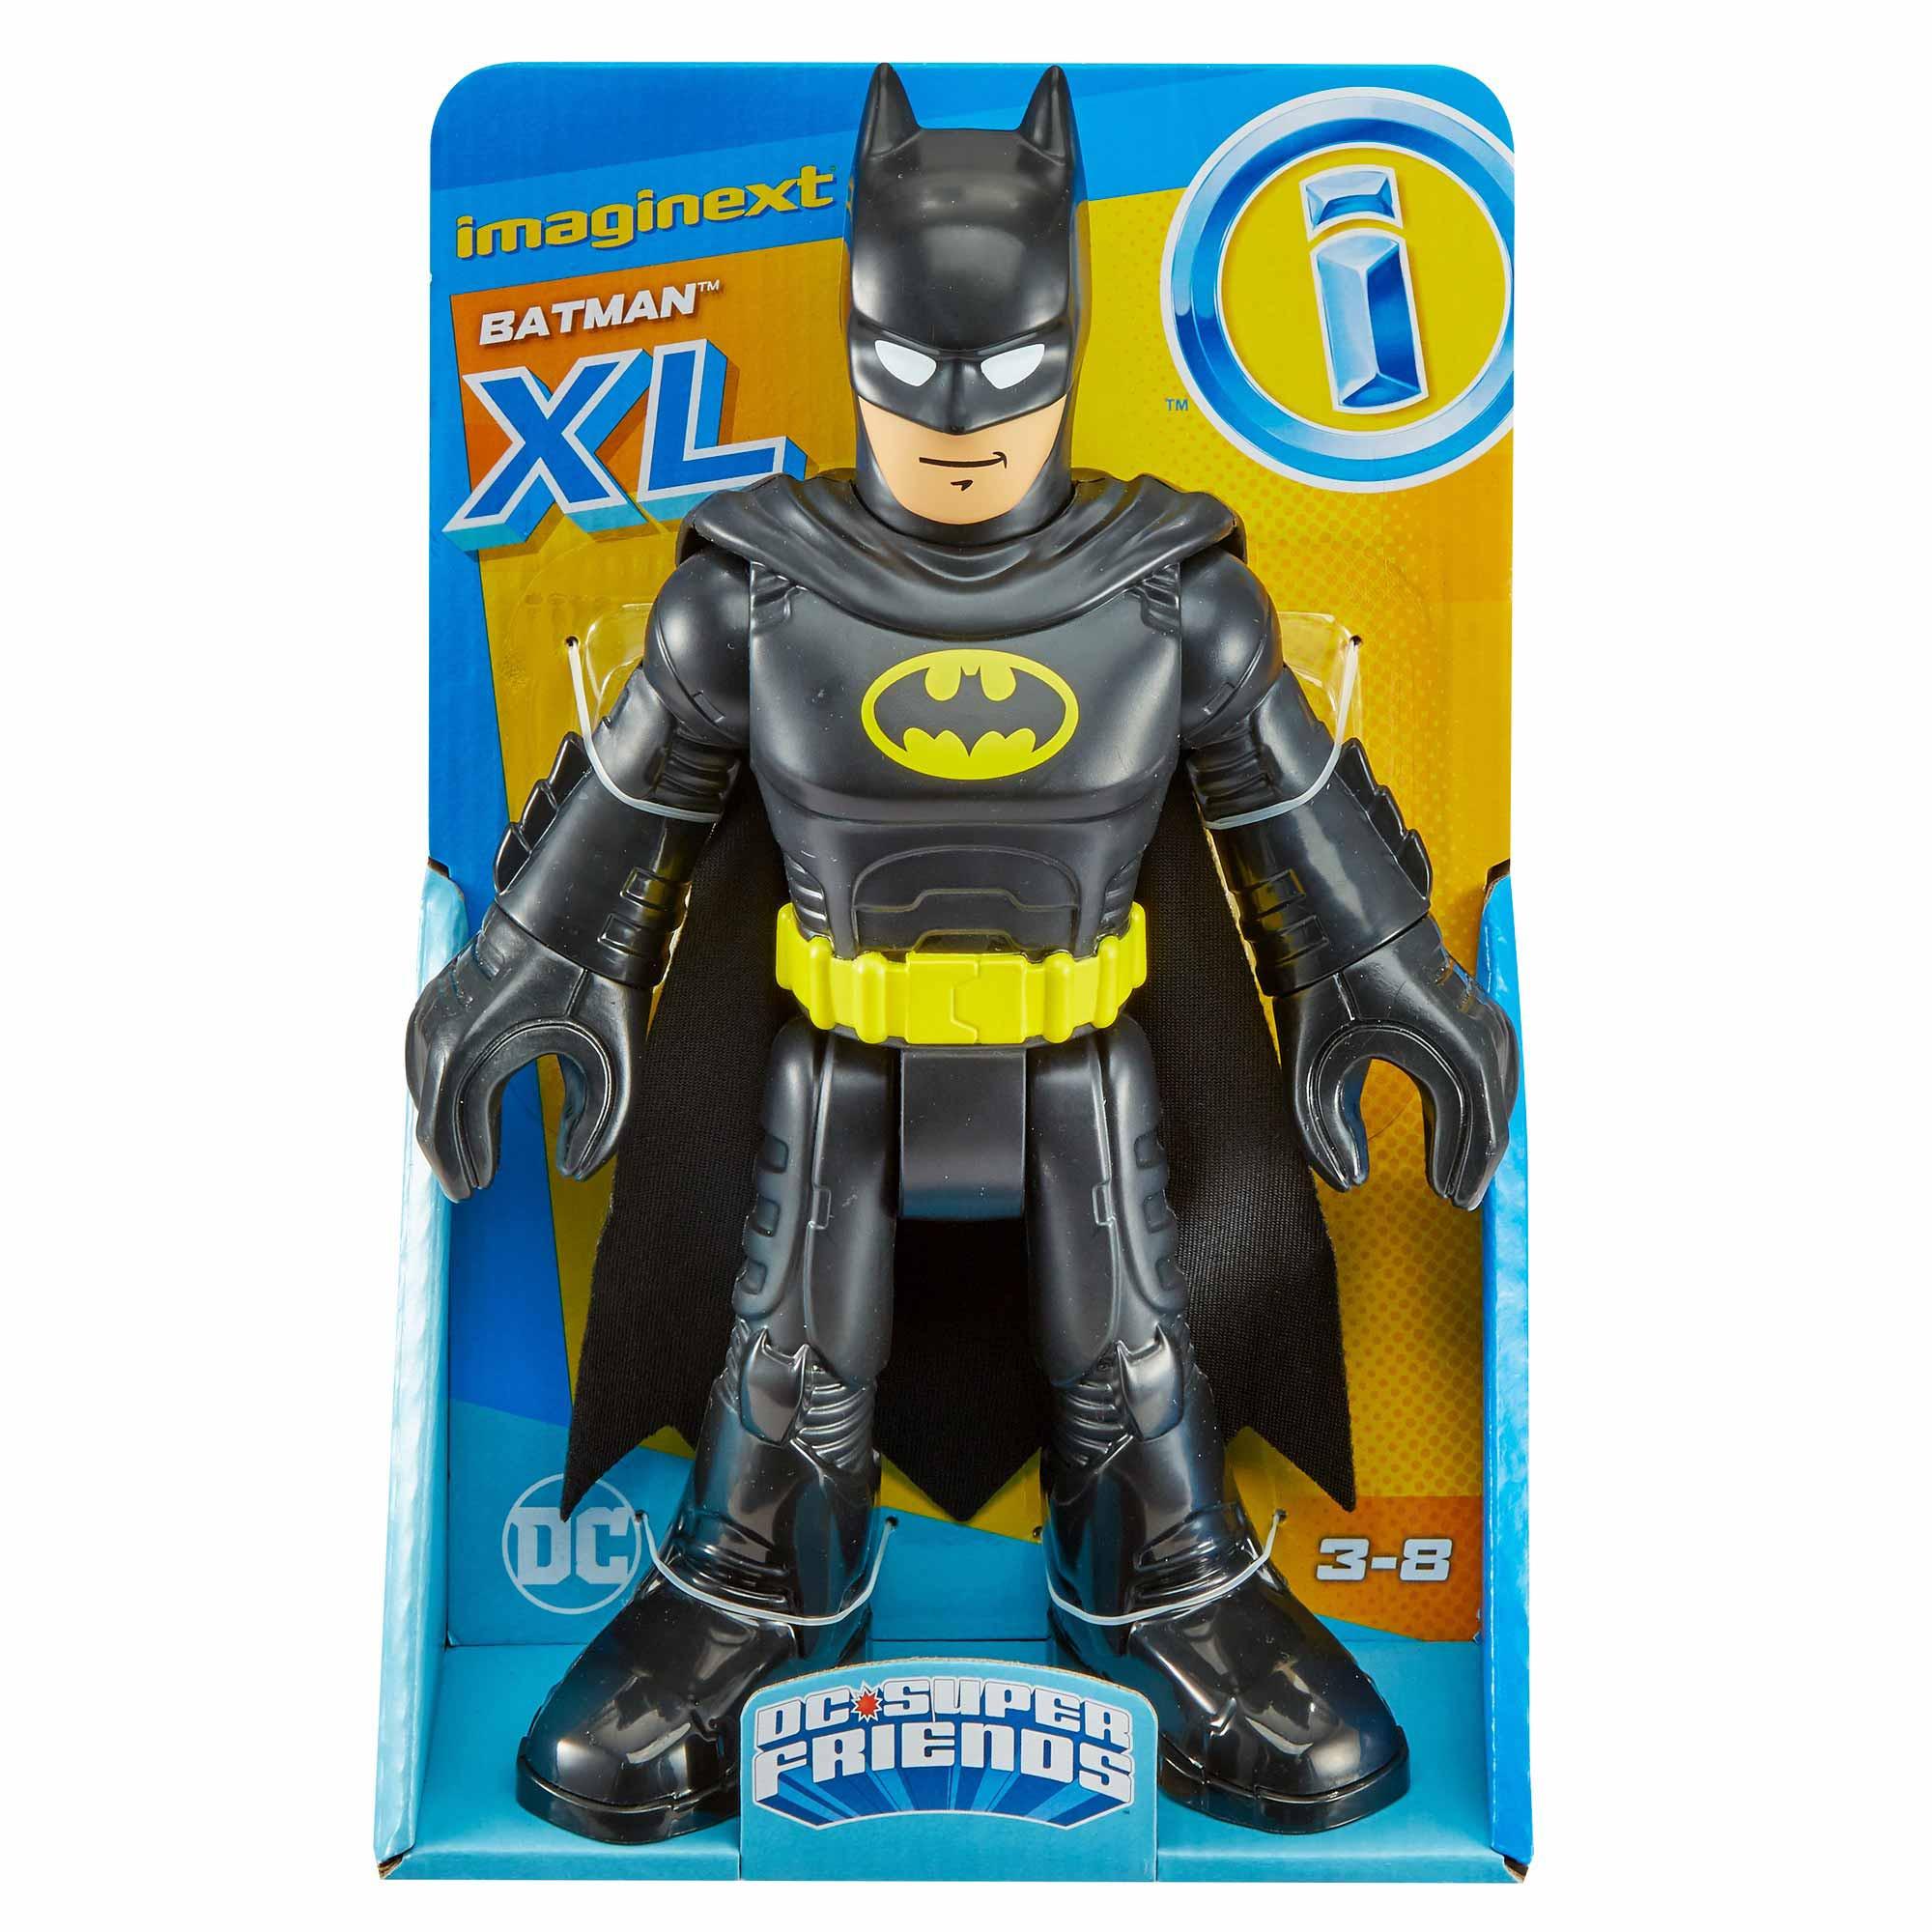 Imaginext DC Super Friends Batman XL